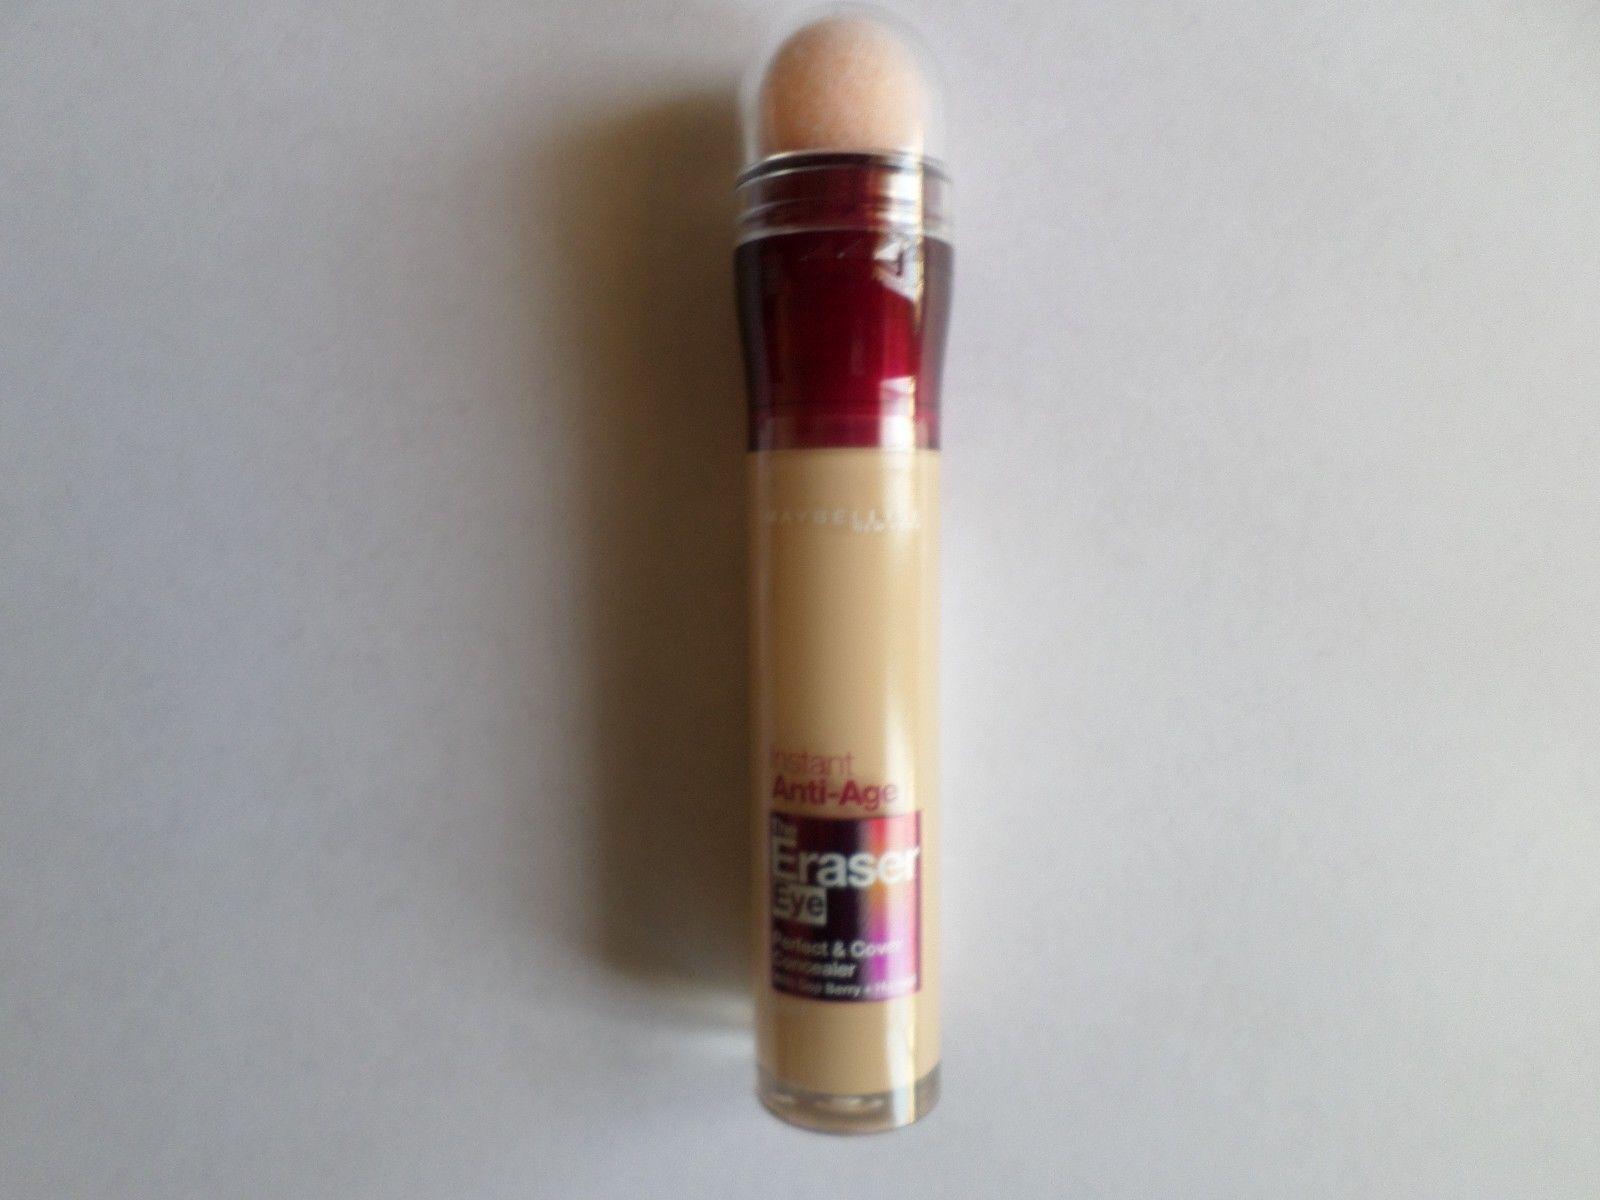 Maybelline Instant Anti Age The Eraser Eye Concealer Light 68ml Eyesential Eyebrush Set Stock Photo